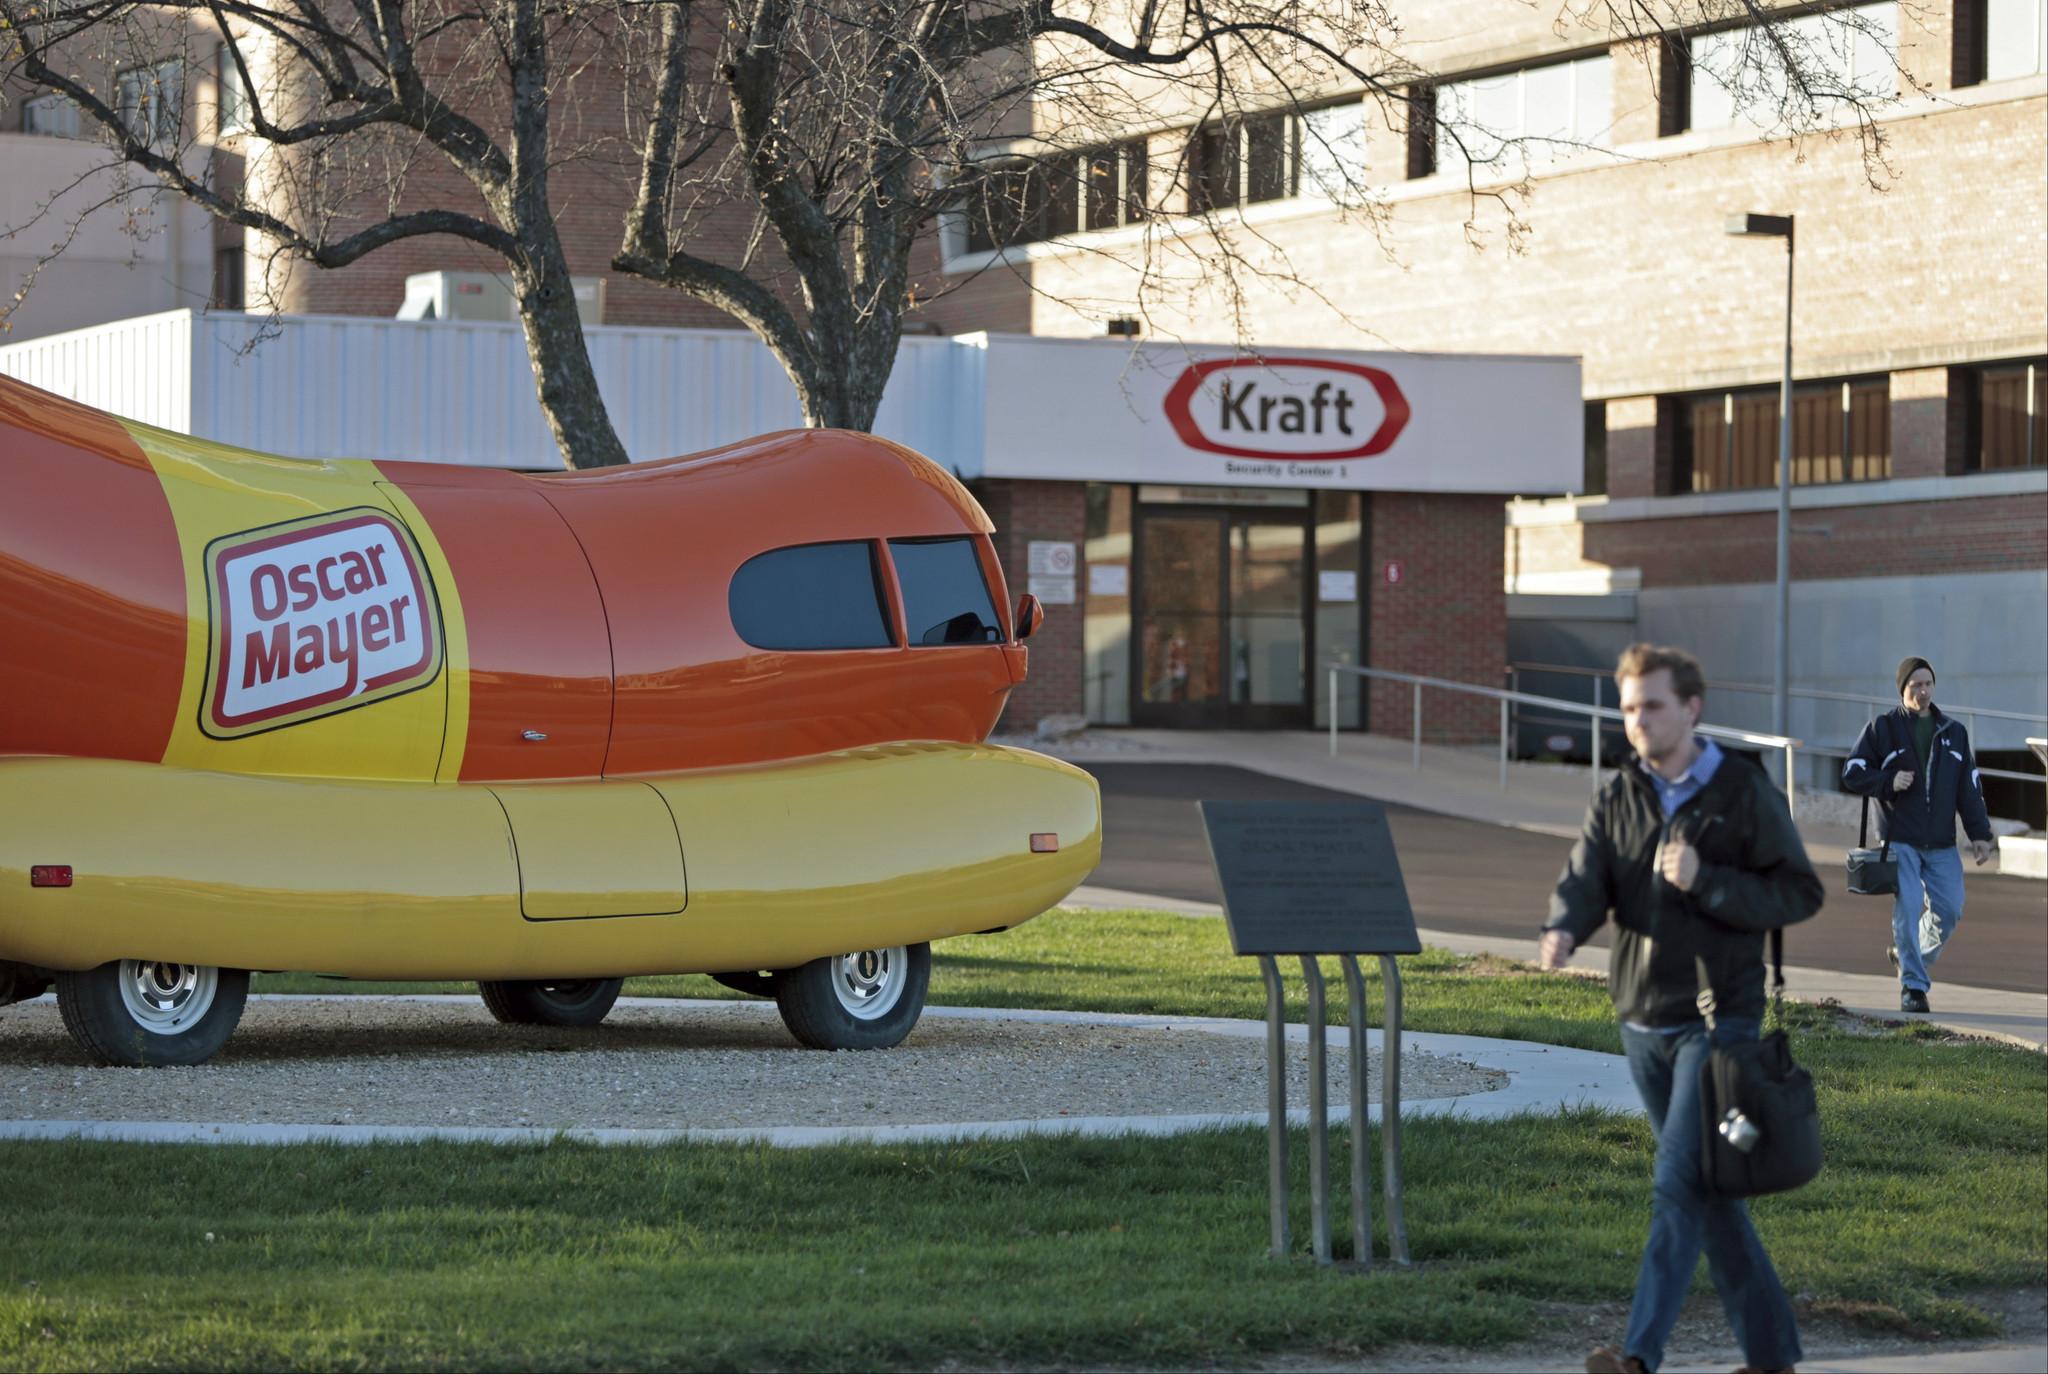 Kraft heinz to move oscar mayer hq to chicago chicago tribune - Kraft foods chicago office ...